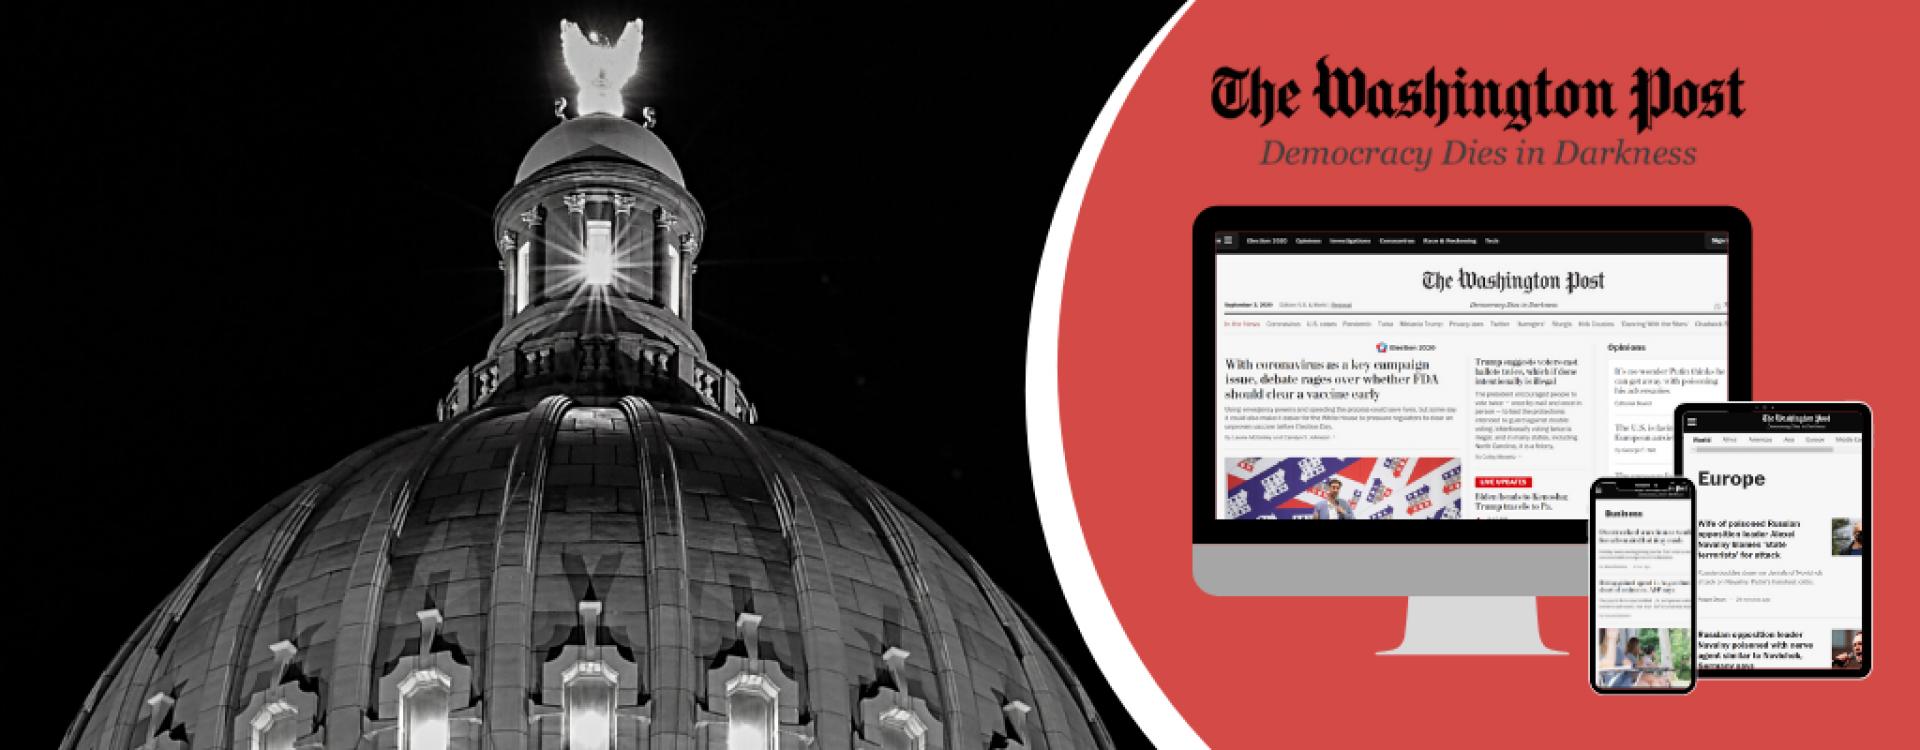 Lehigh Libraries bring you The Washington Post